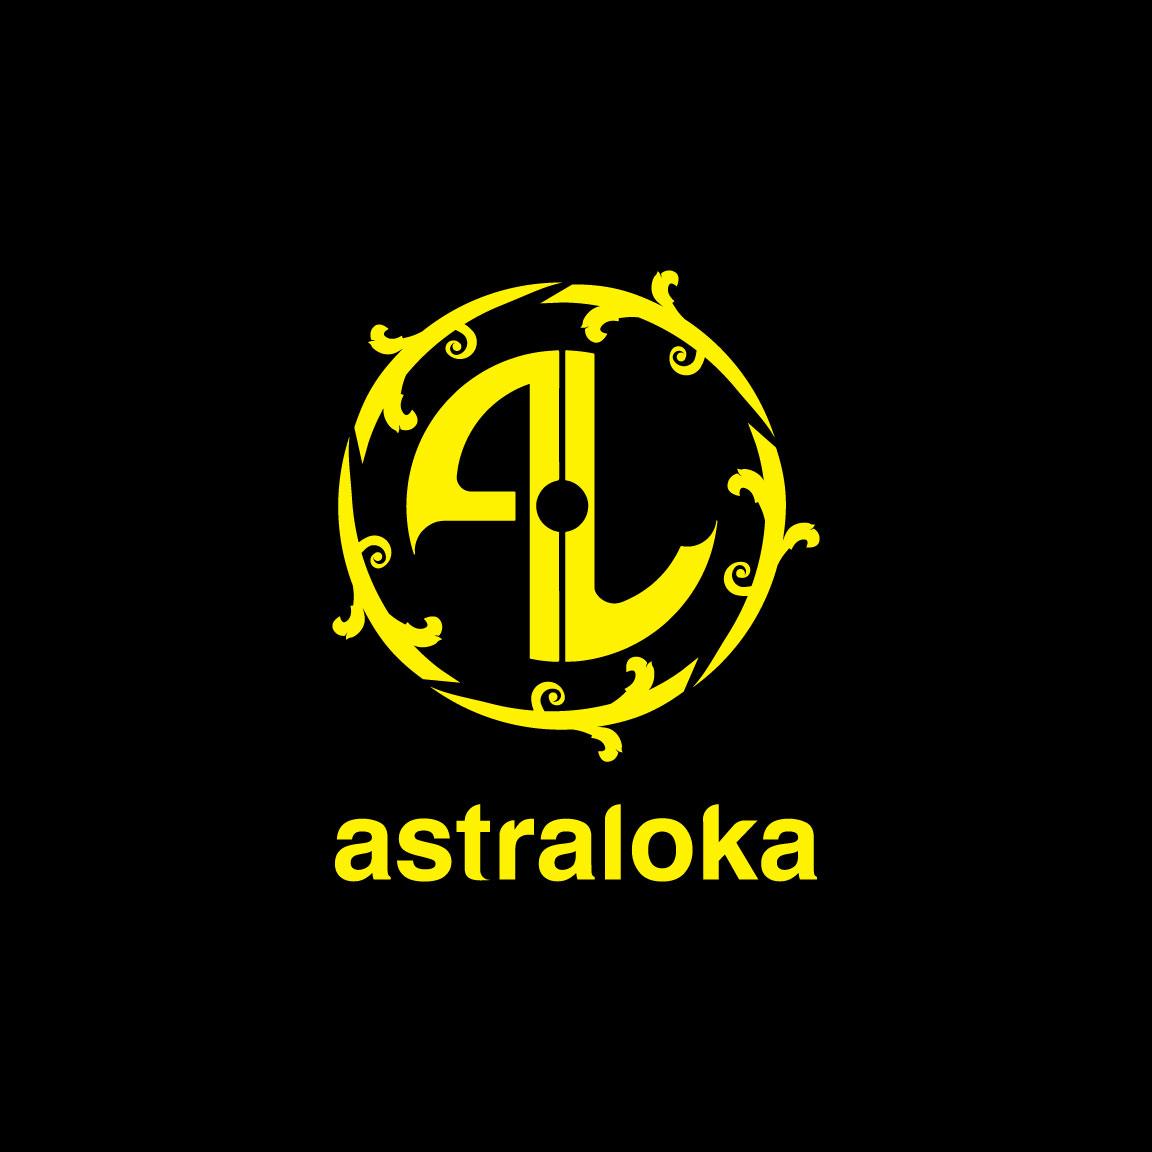 Astraloka